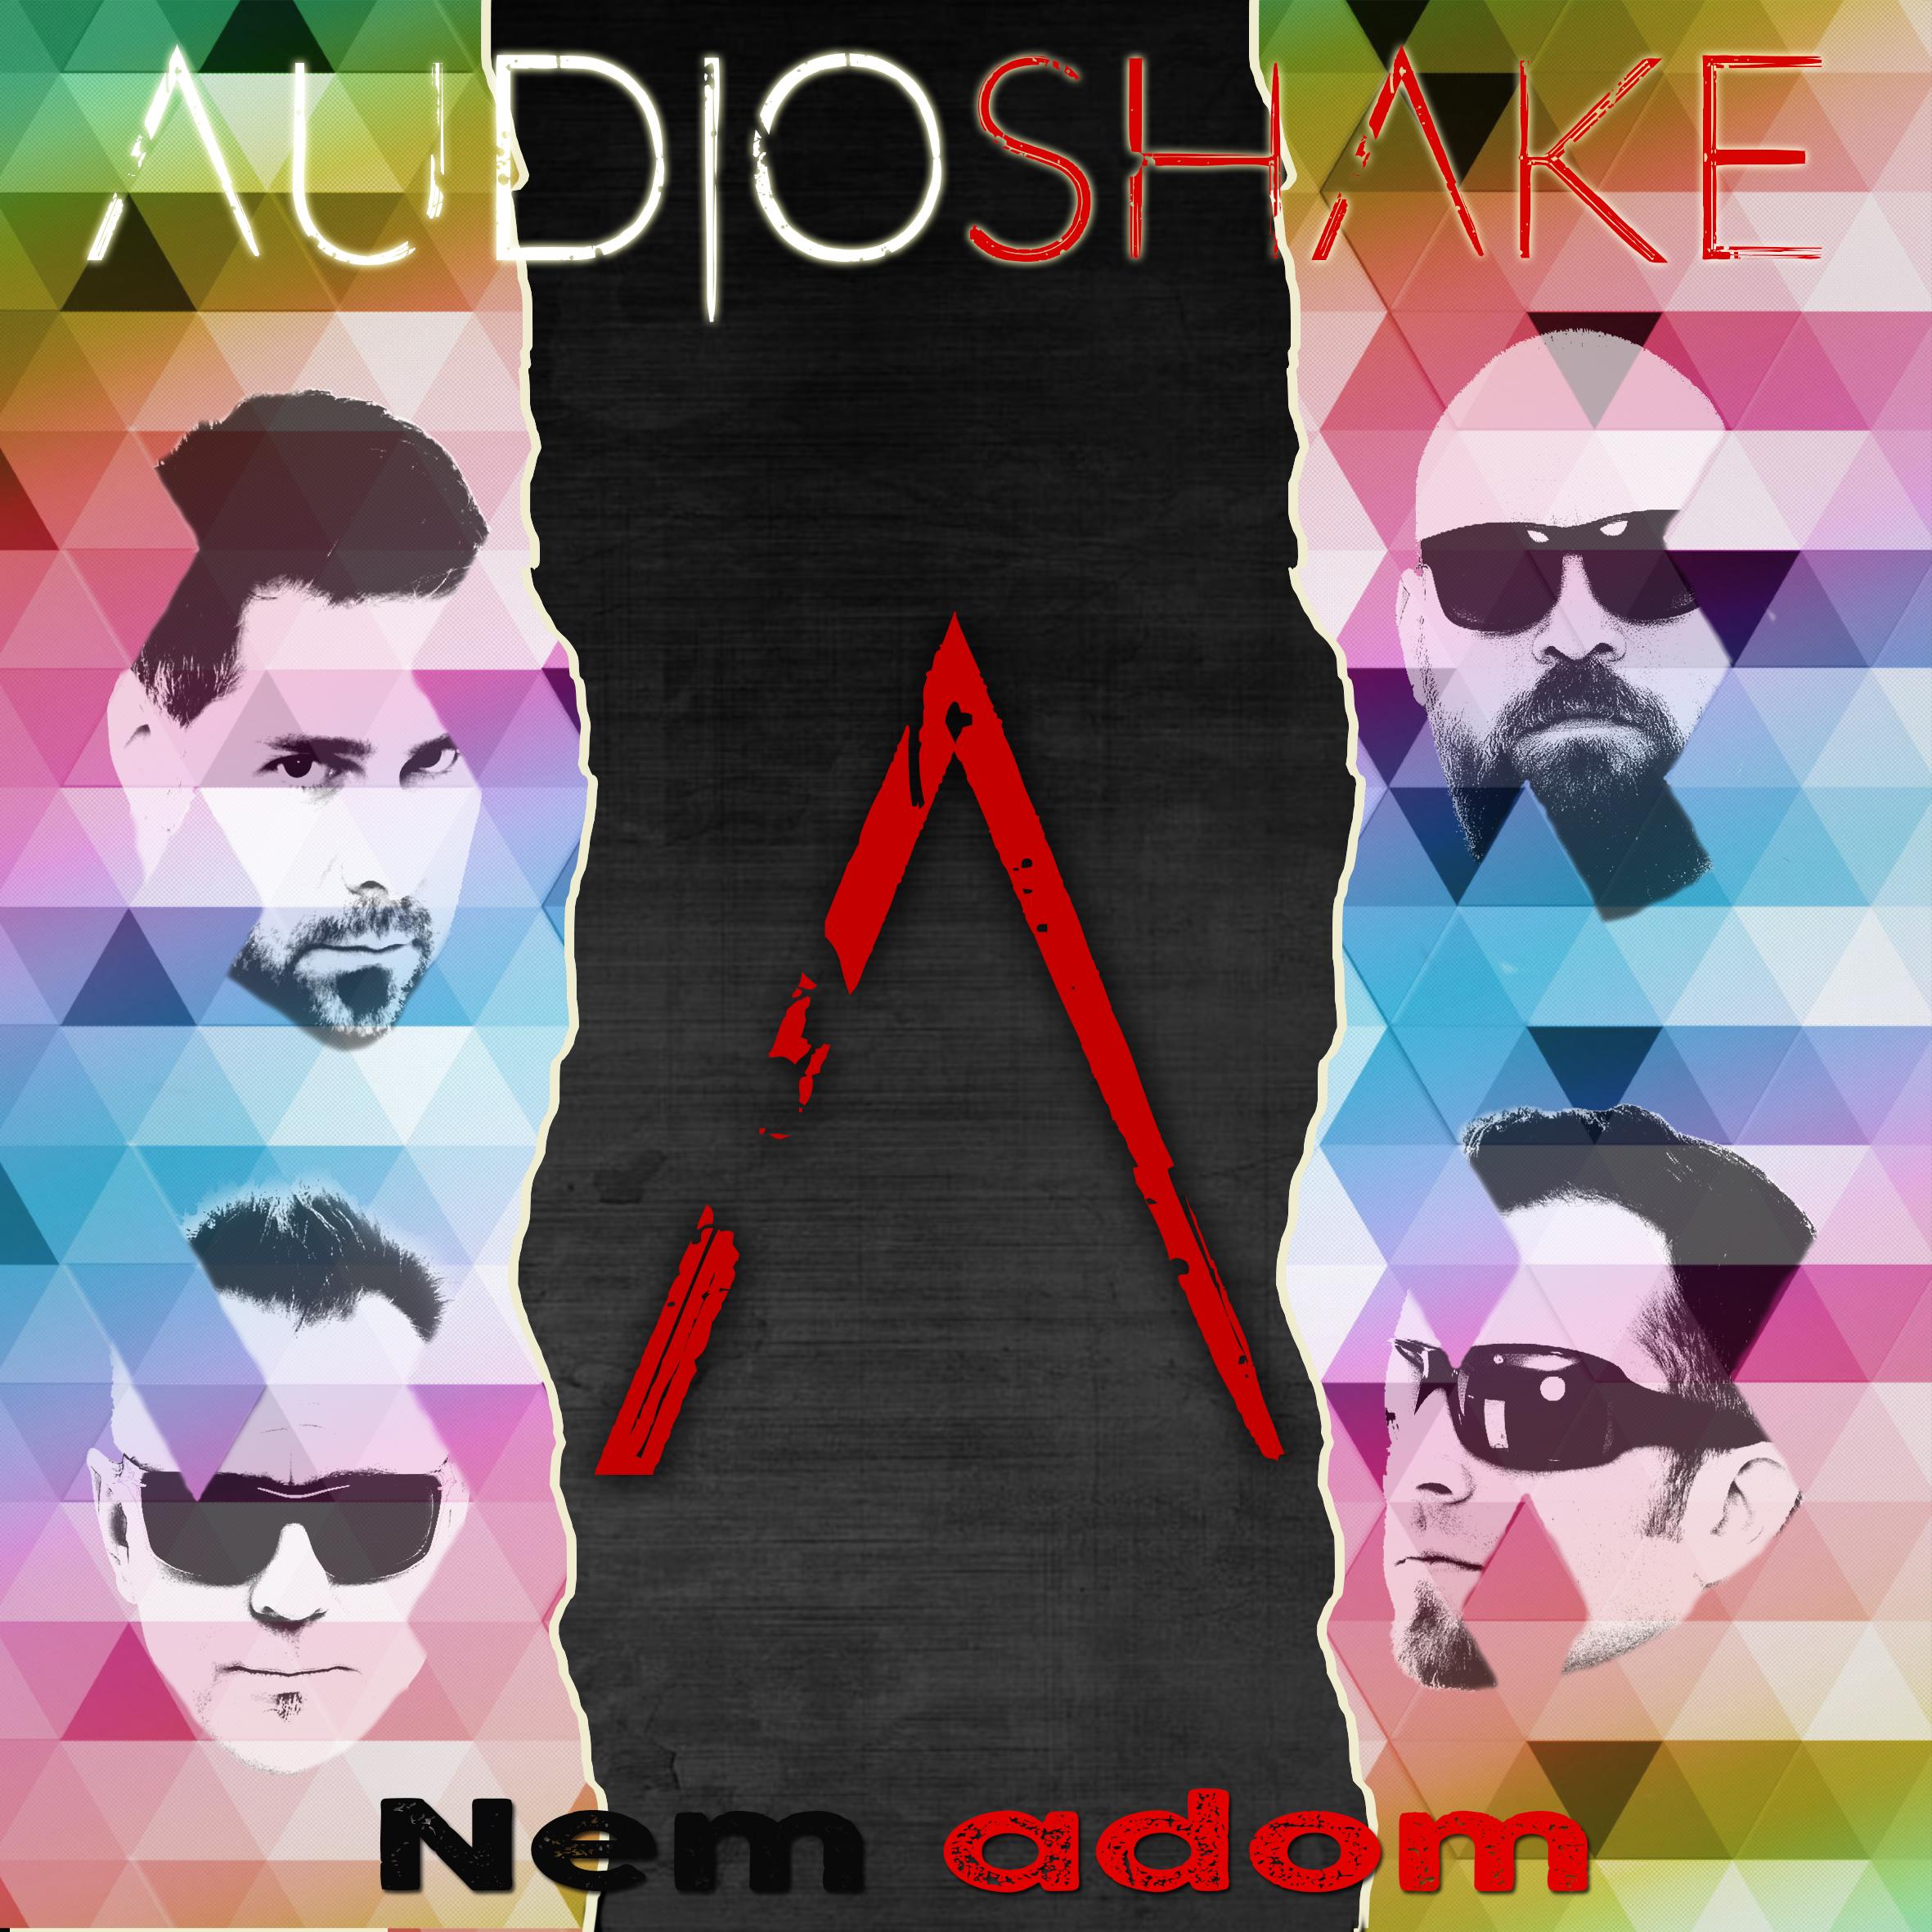 Audioshake Nem adom